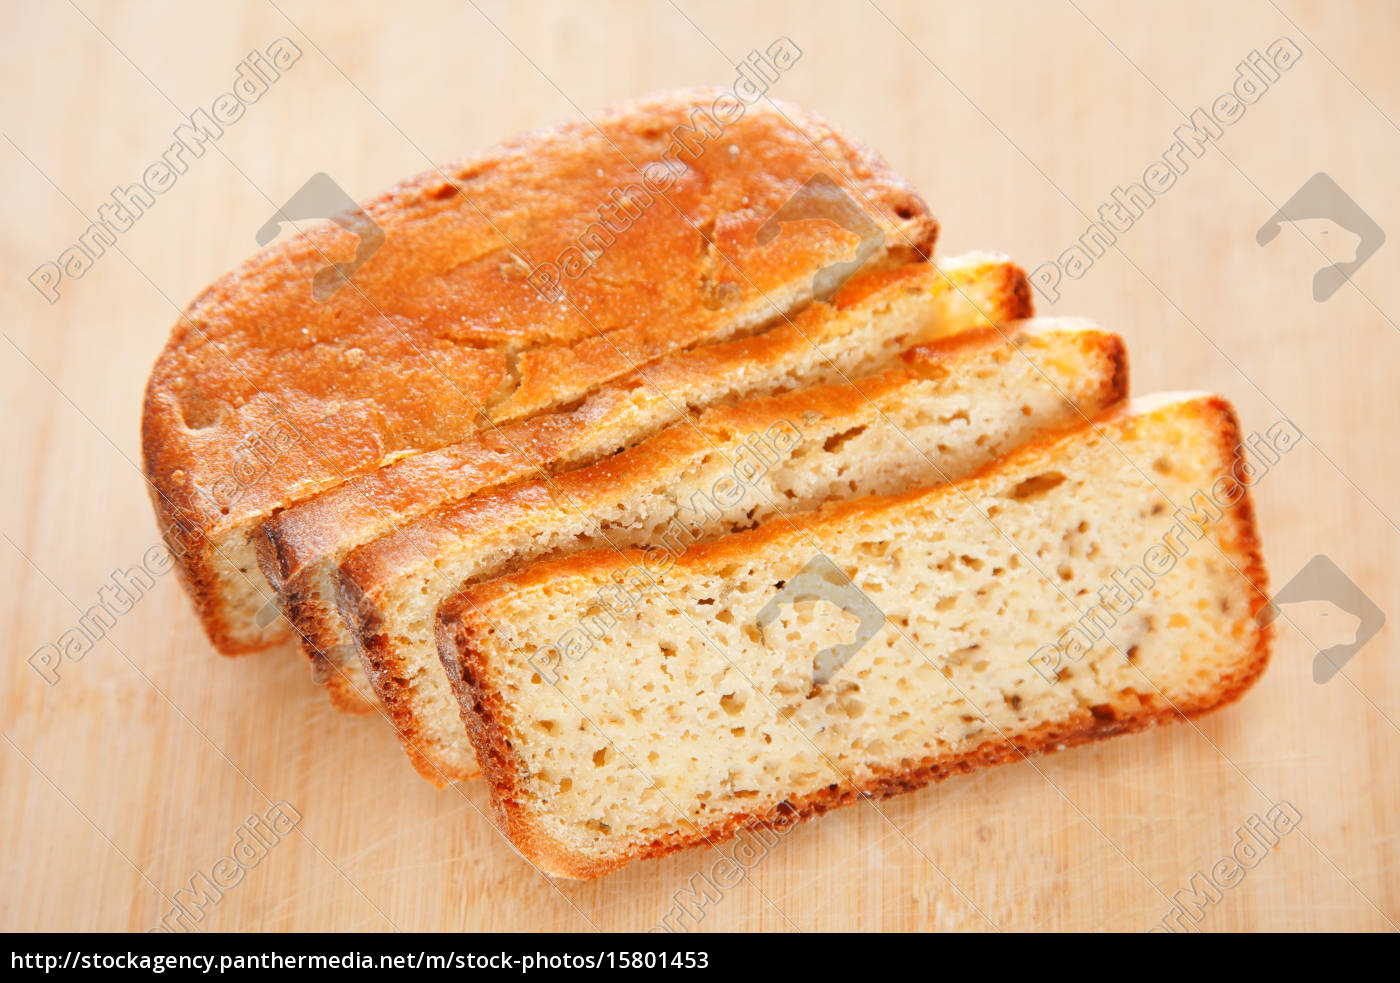 homemade, bread, homemade, bread, homemade, bread, homemade, bread, homemade, bread, homemade - 15801453